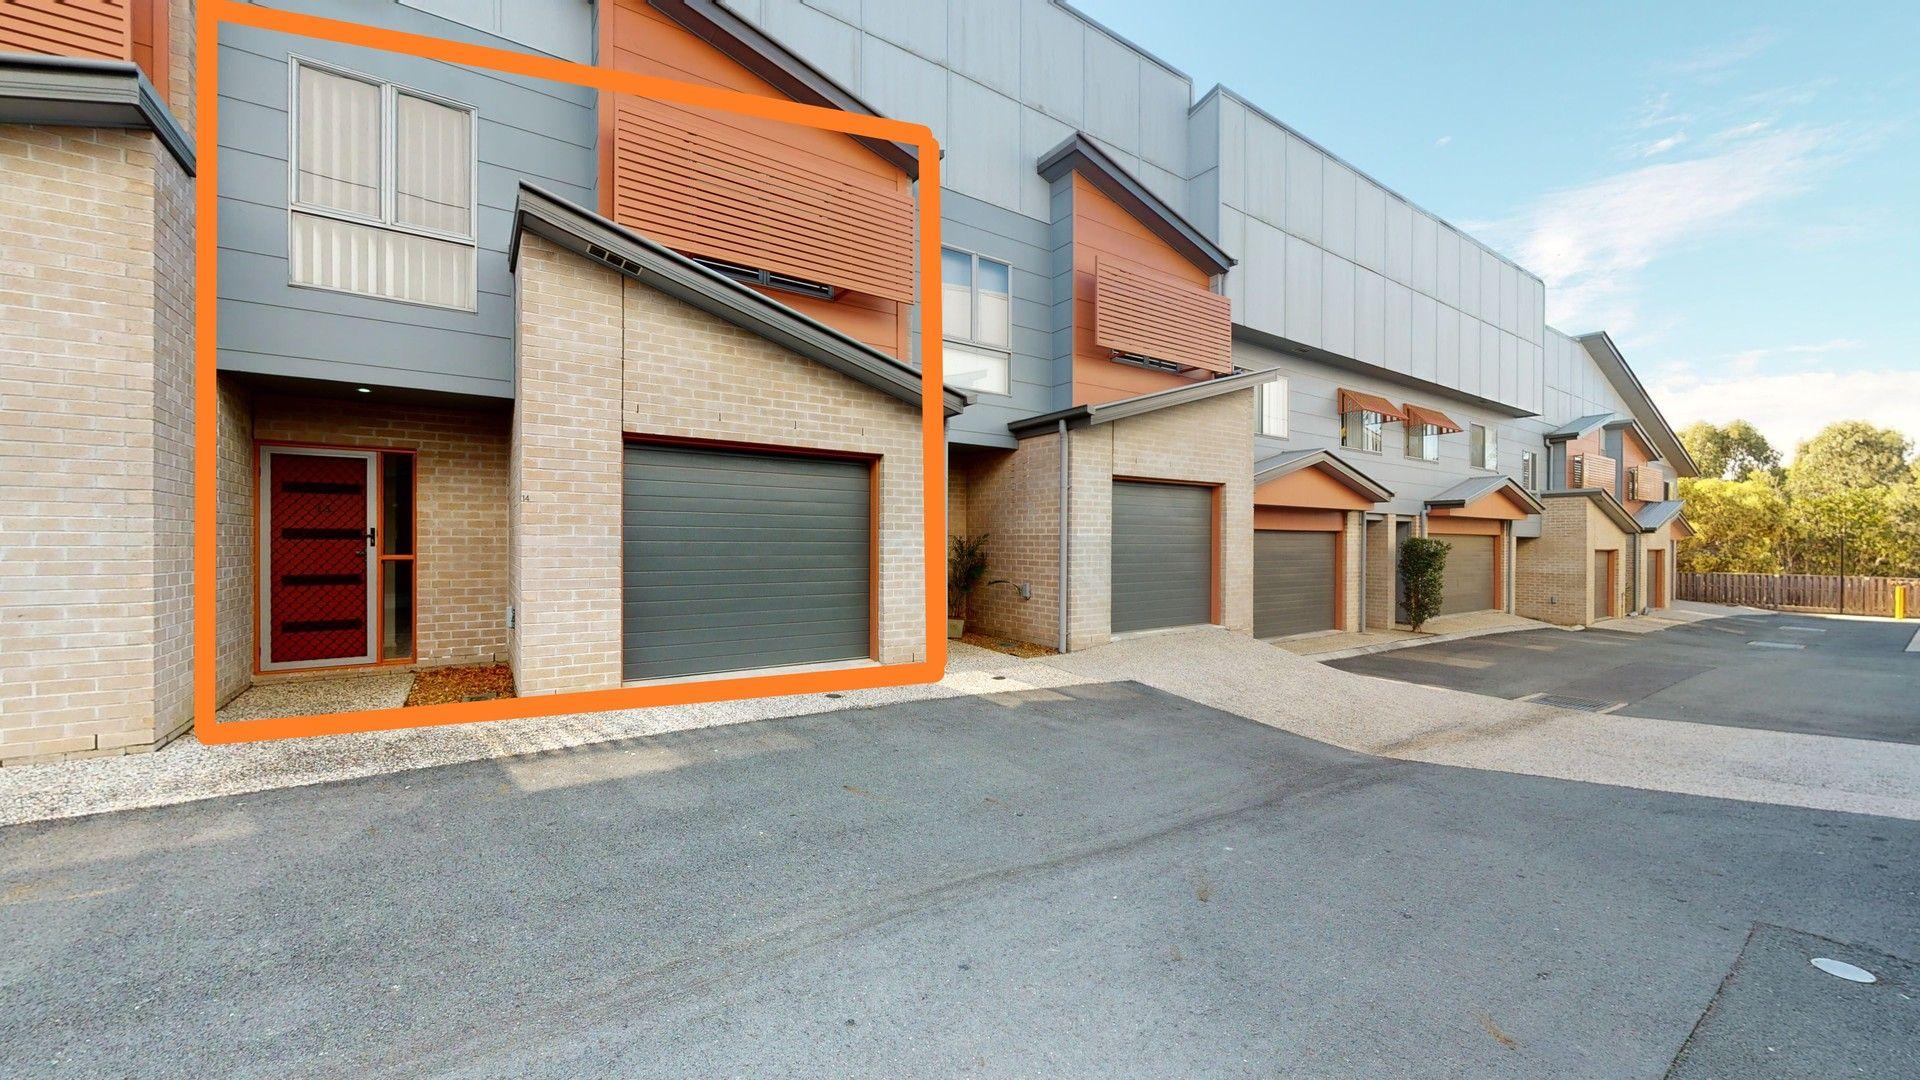 14/2 Reserve Court, Murrumba Downs QLD 4503, Image 0